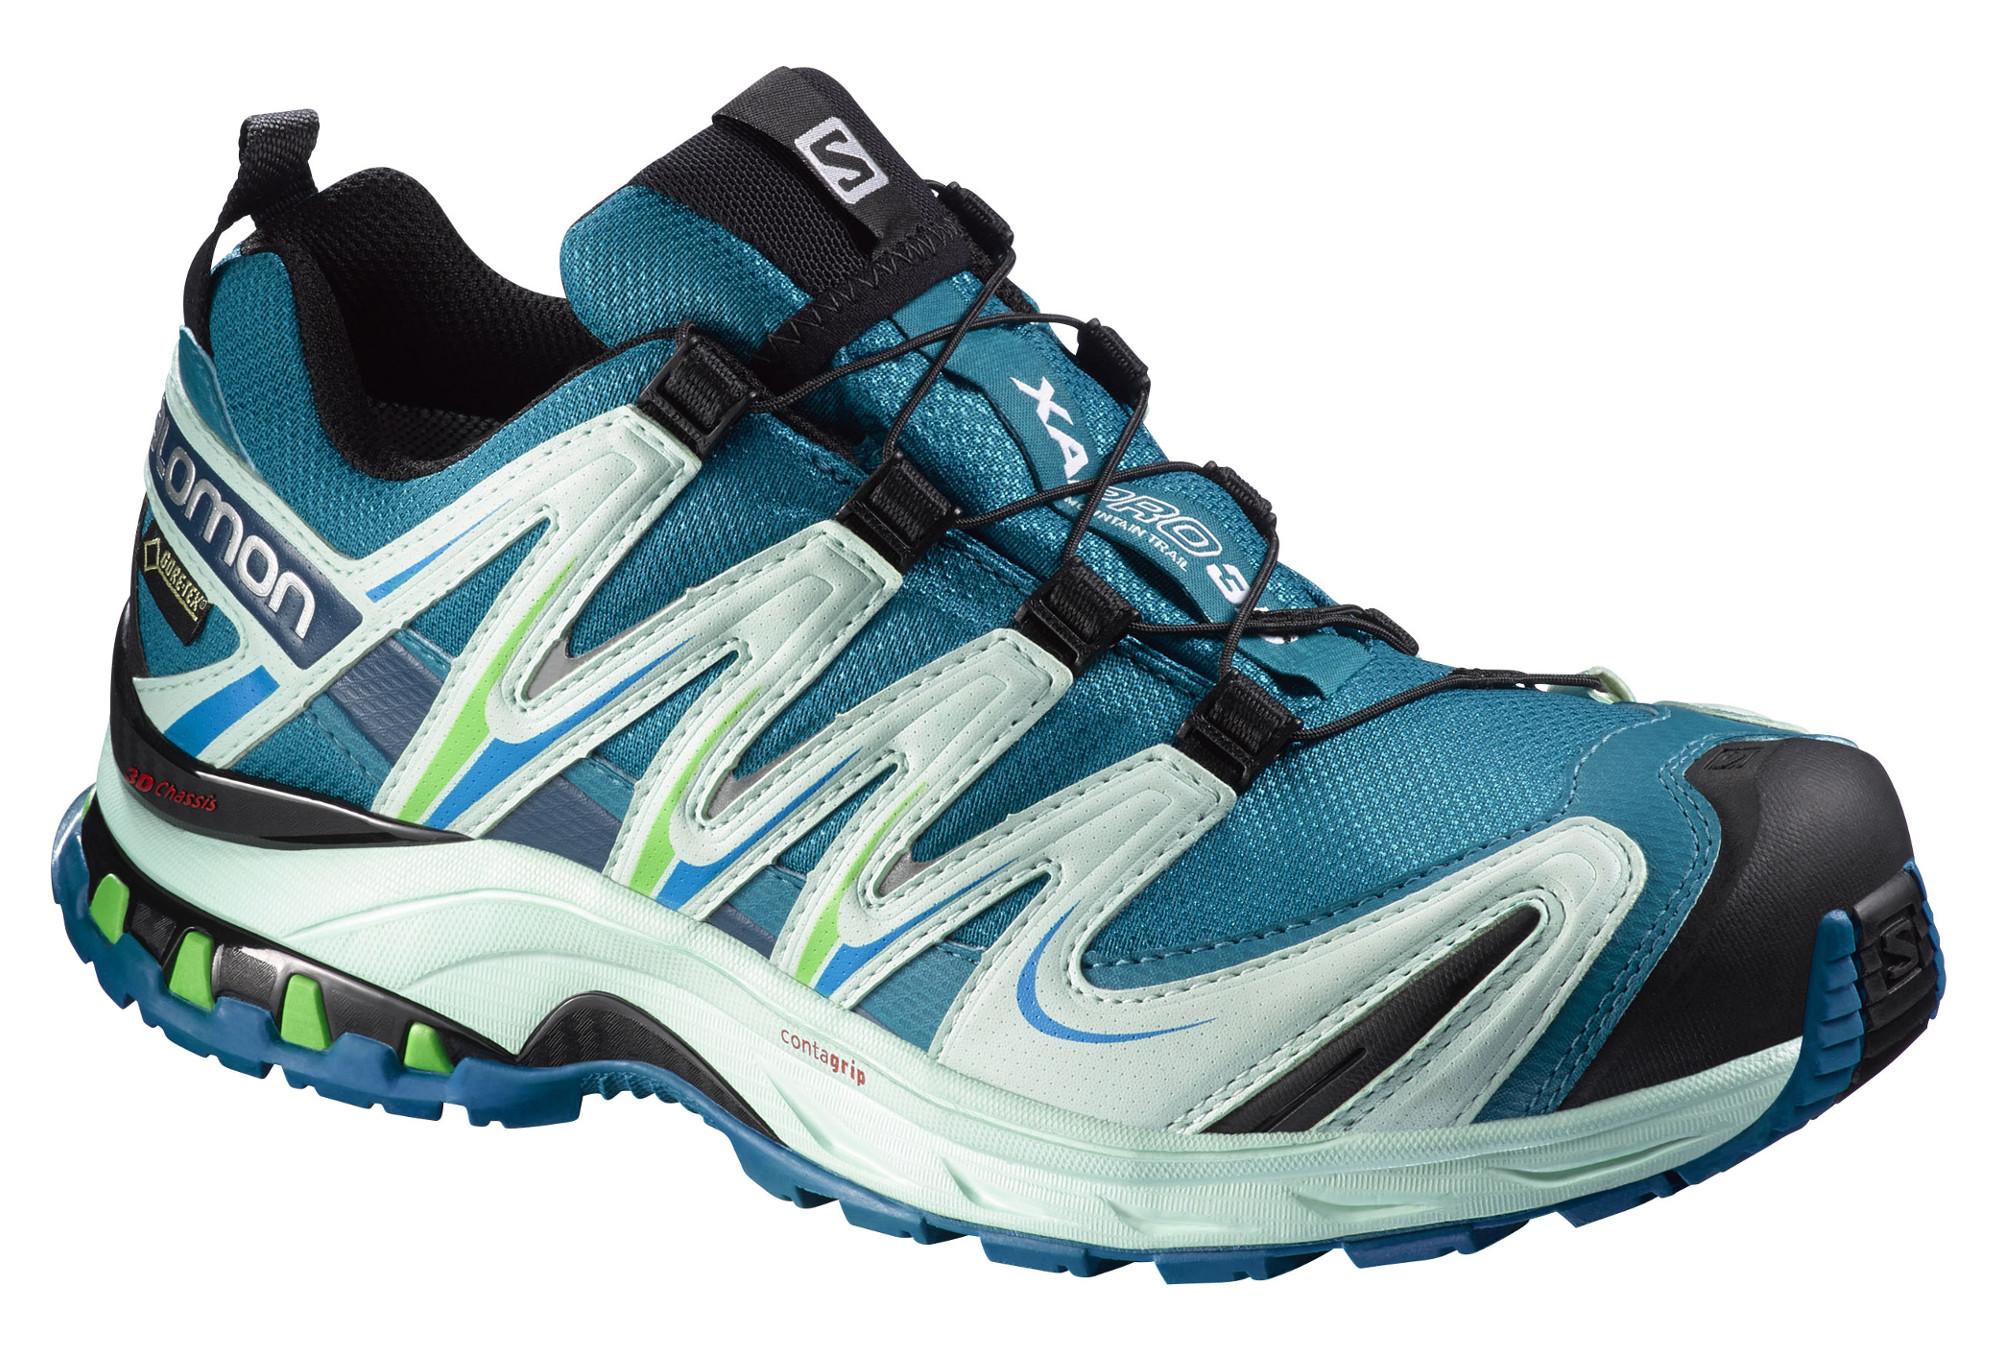 de Trail XA PRO Femme 3D Chaussures GTX Bleu Salomon qA3R54Lj